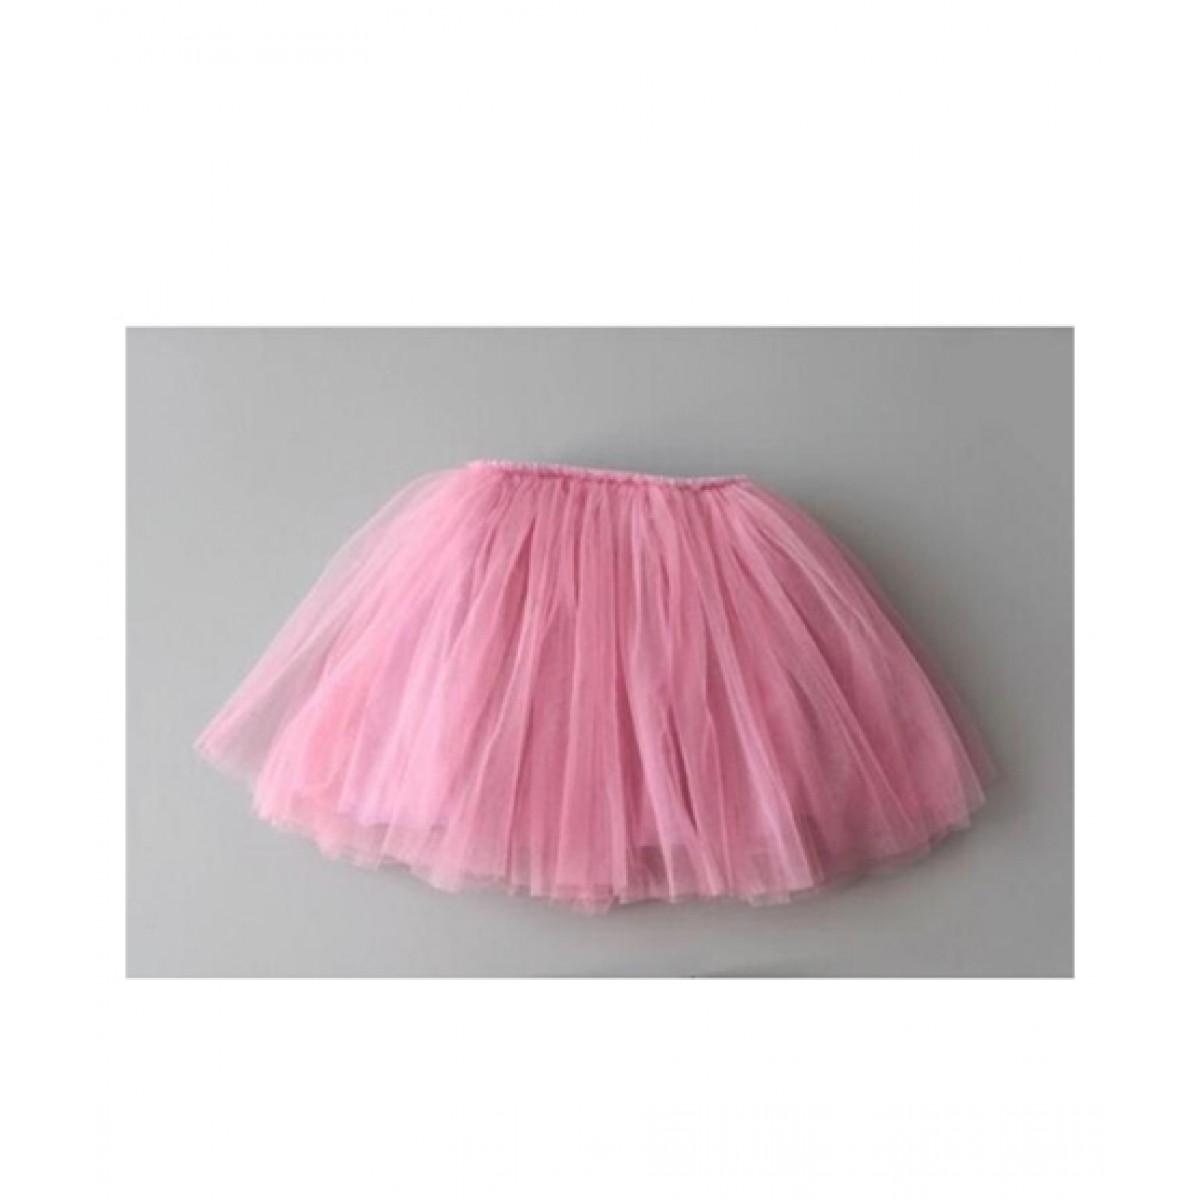 FashionValley Multilayer Fluffy Mesh Skirt For Baby Girl (0053)